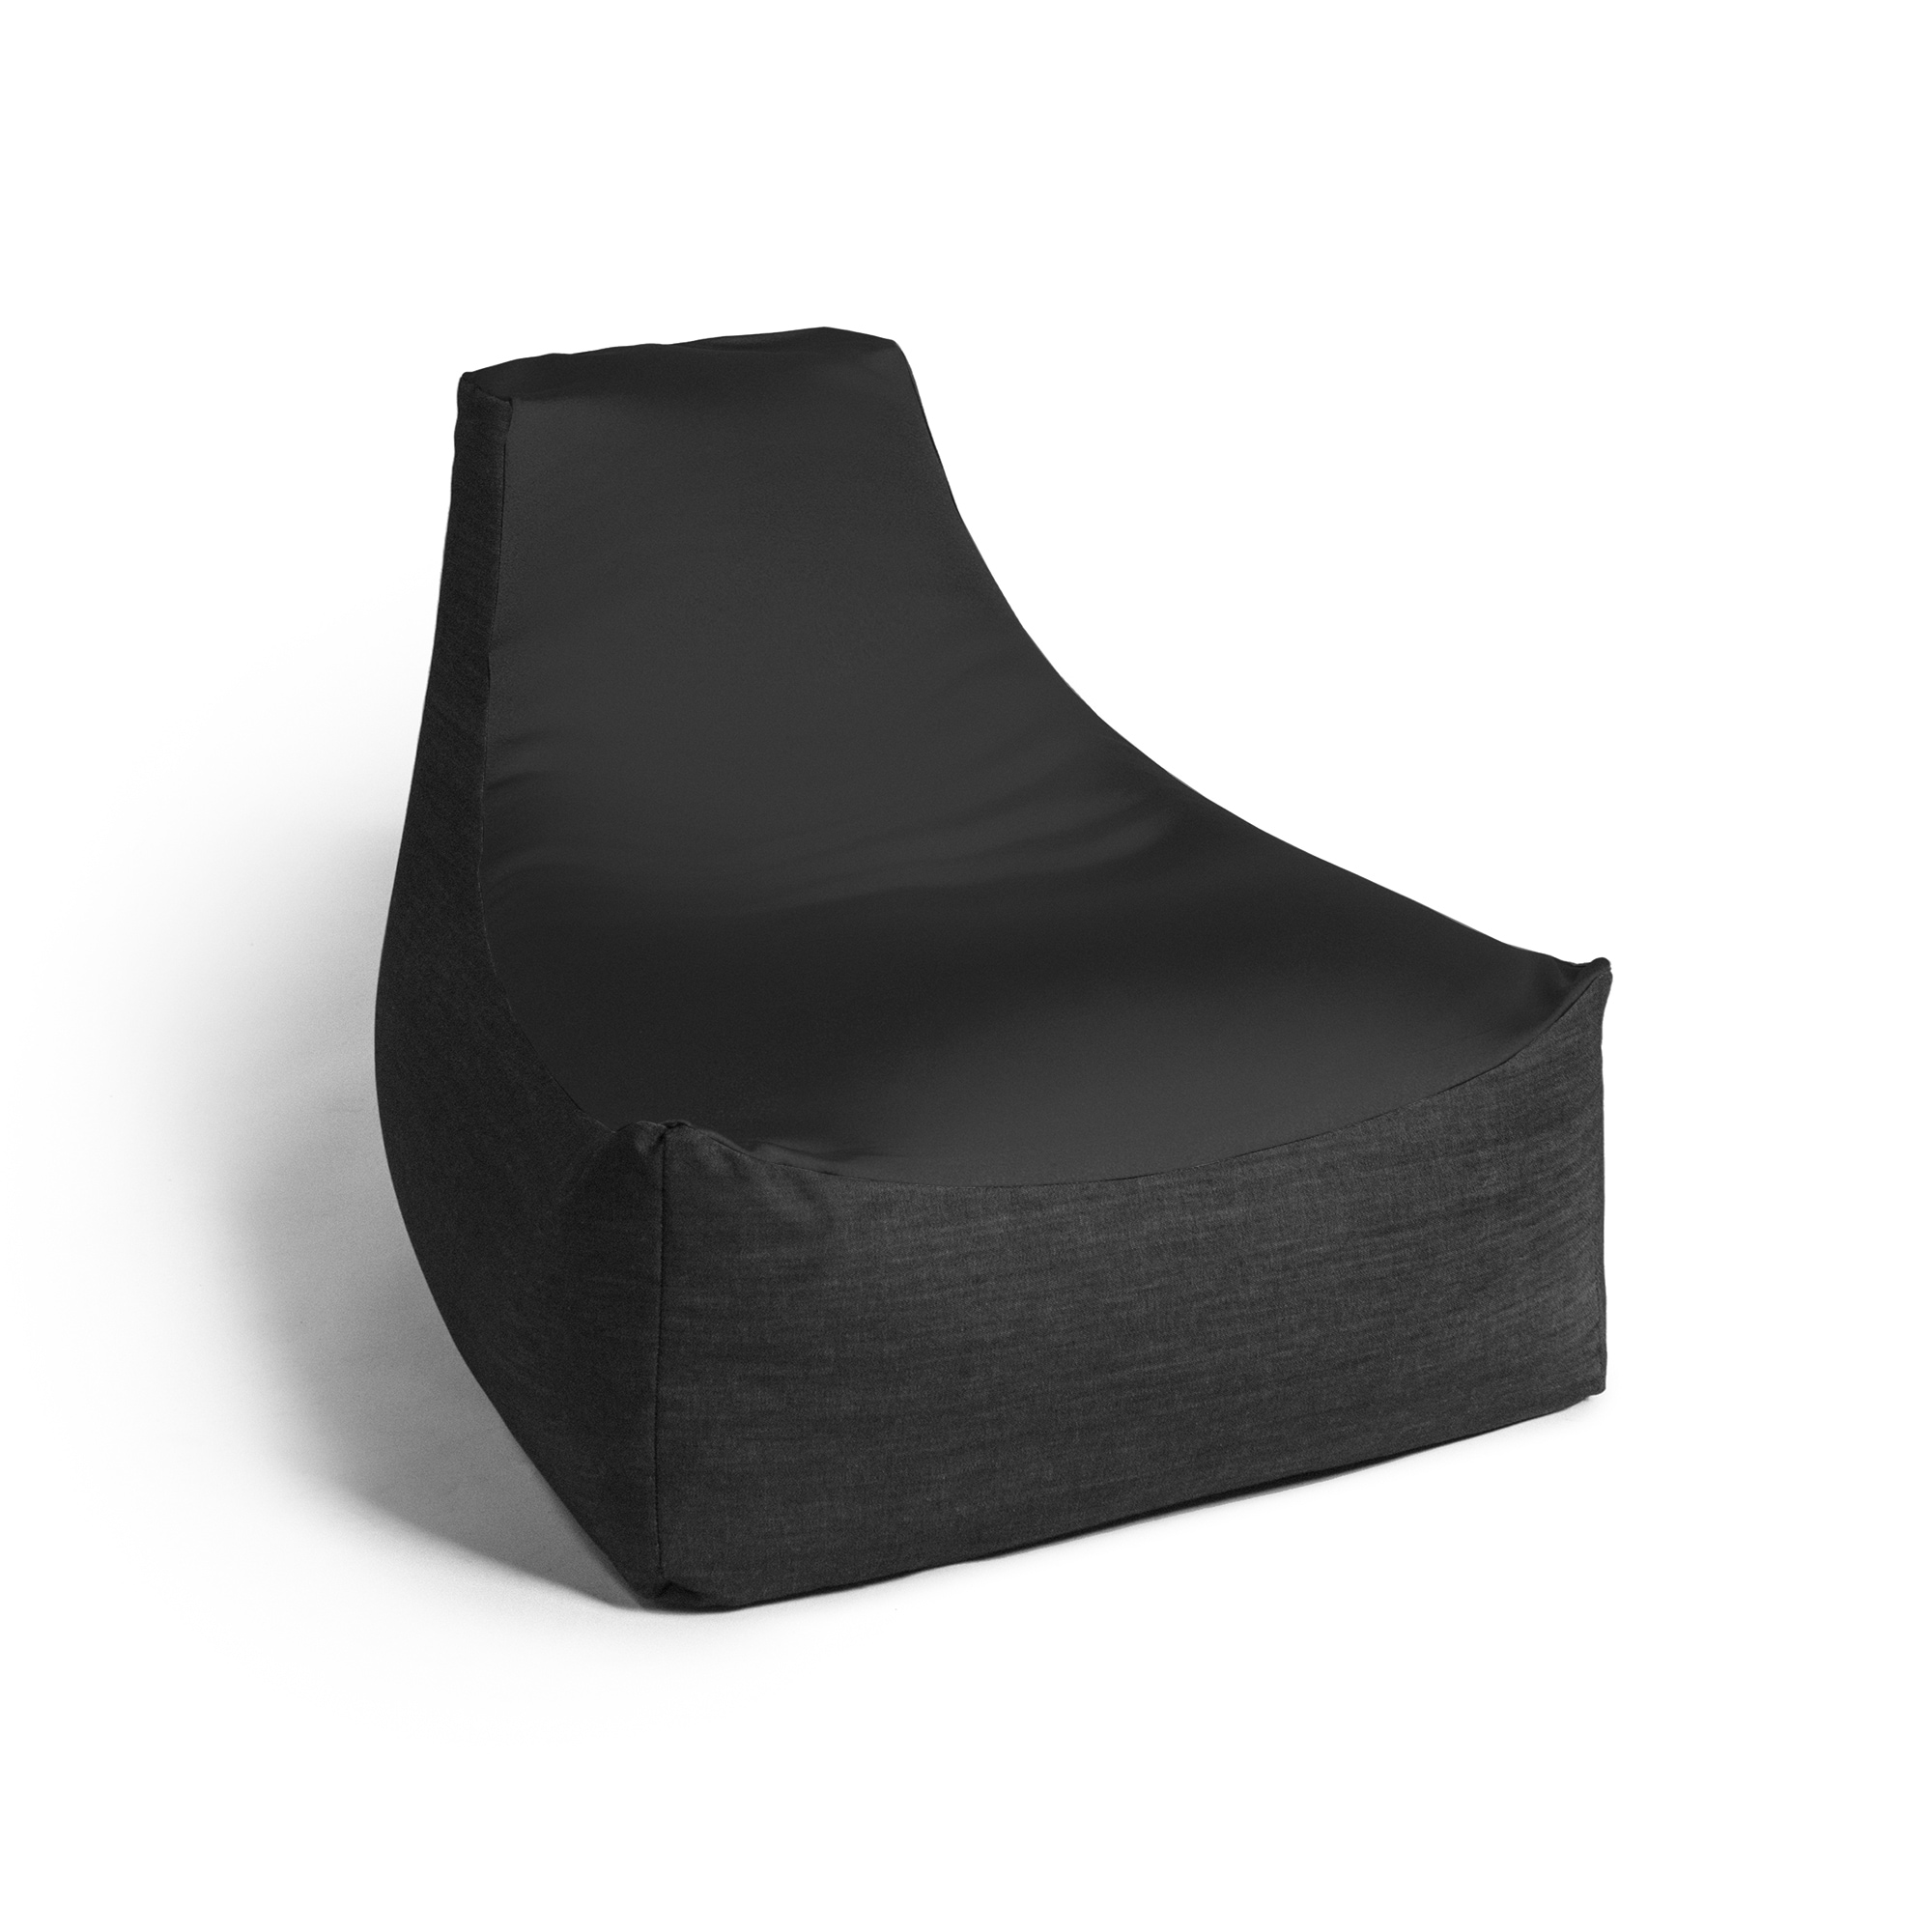 jaxx bean bag chairs oversized chair canada bags strato gaming walmart com